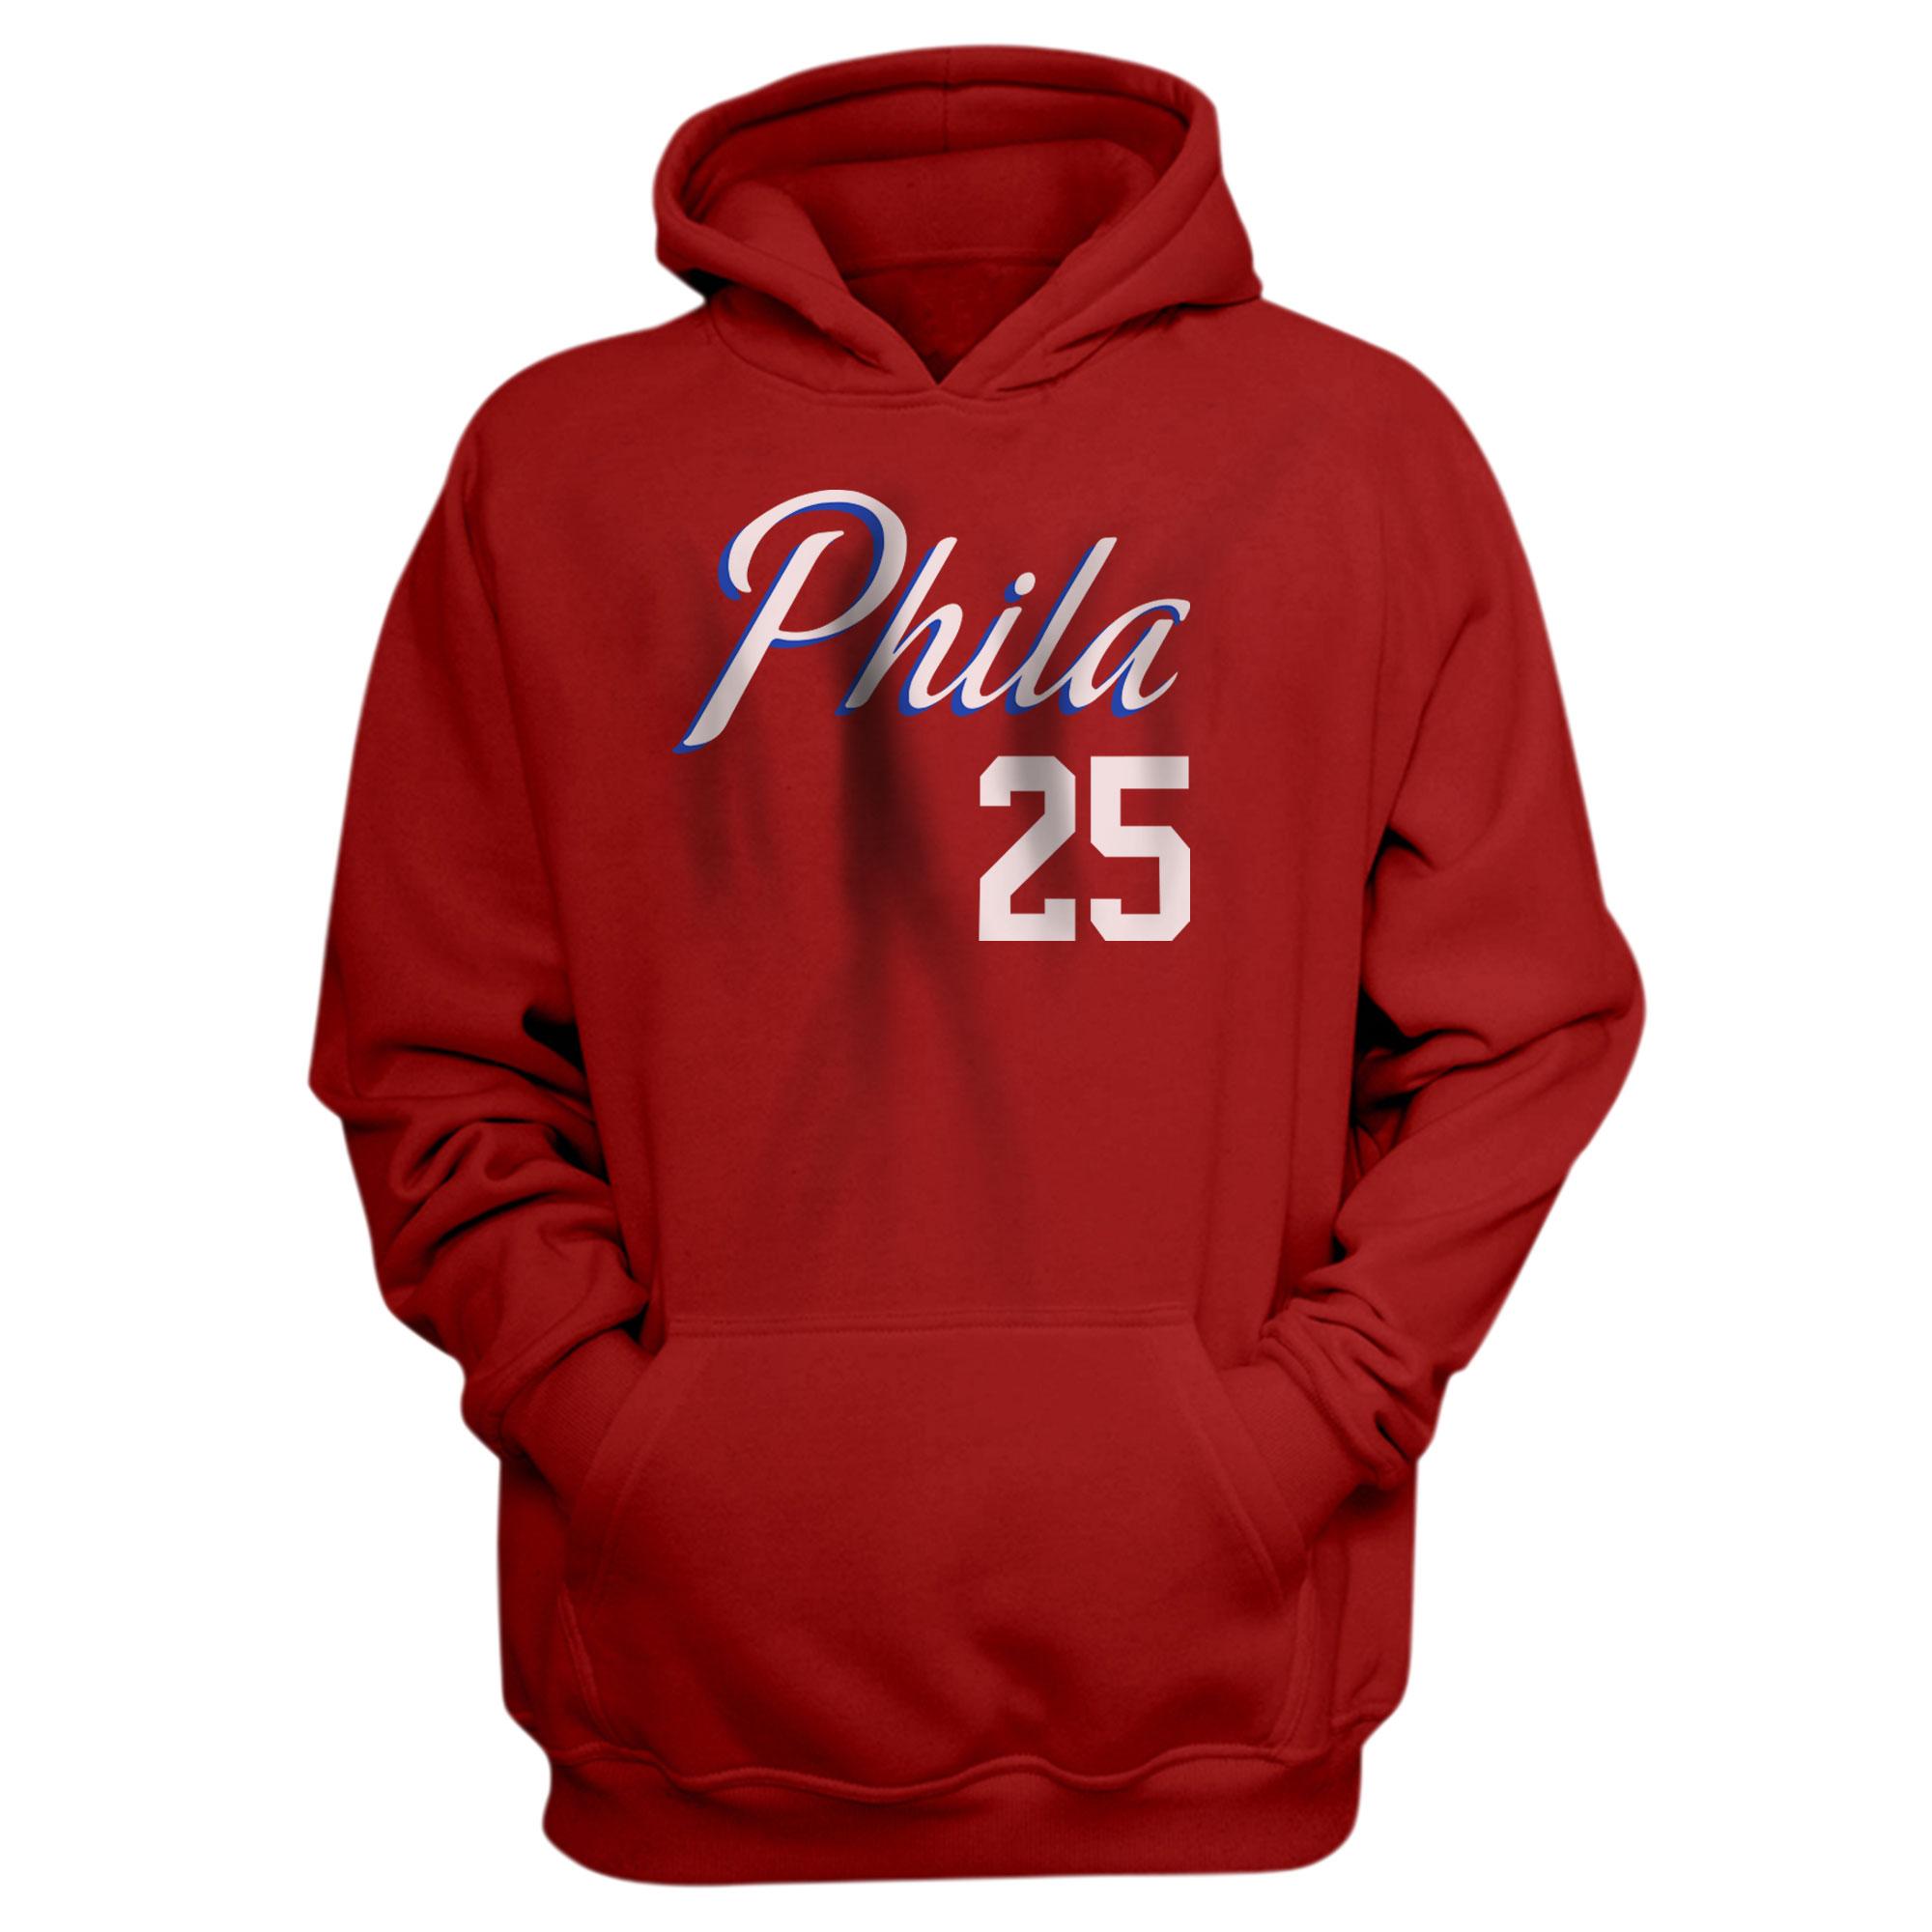 Philadelphia 76ers Ben Simmons  Hoodie (HD-RED-NP-504-25)